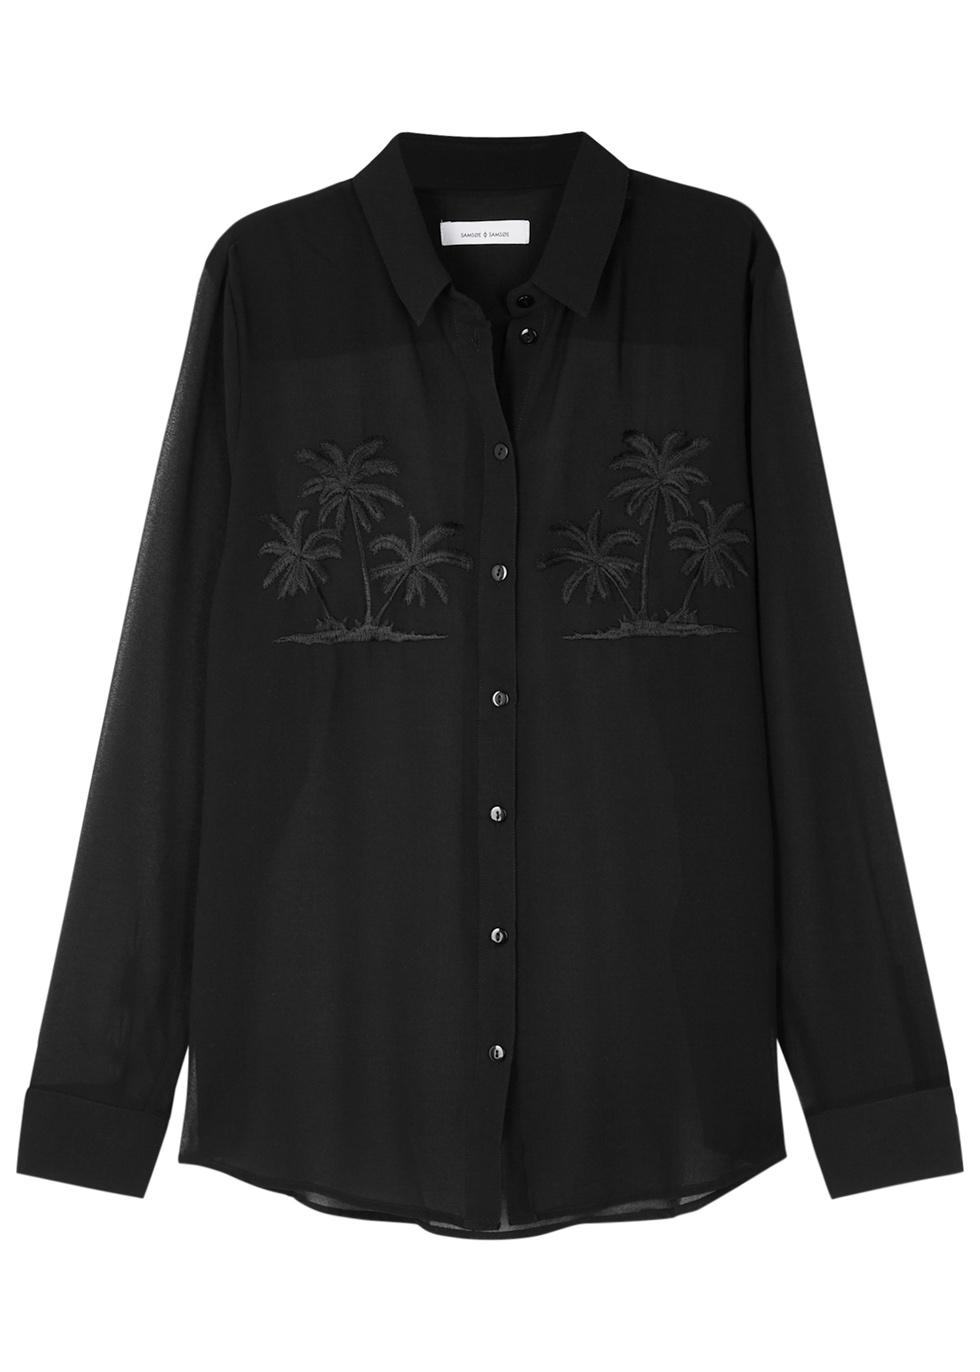 SAMS0E & SAMS0E Maj Embroidered Chiffon Shirt in Black